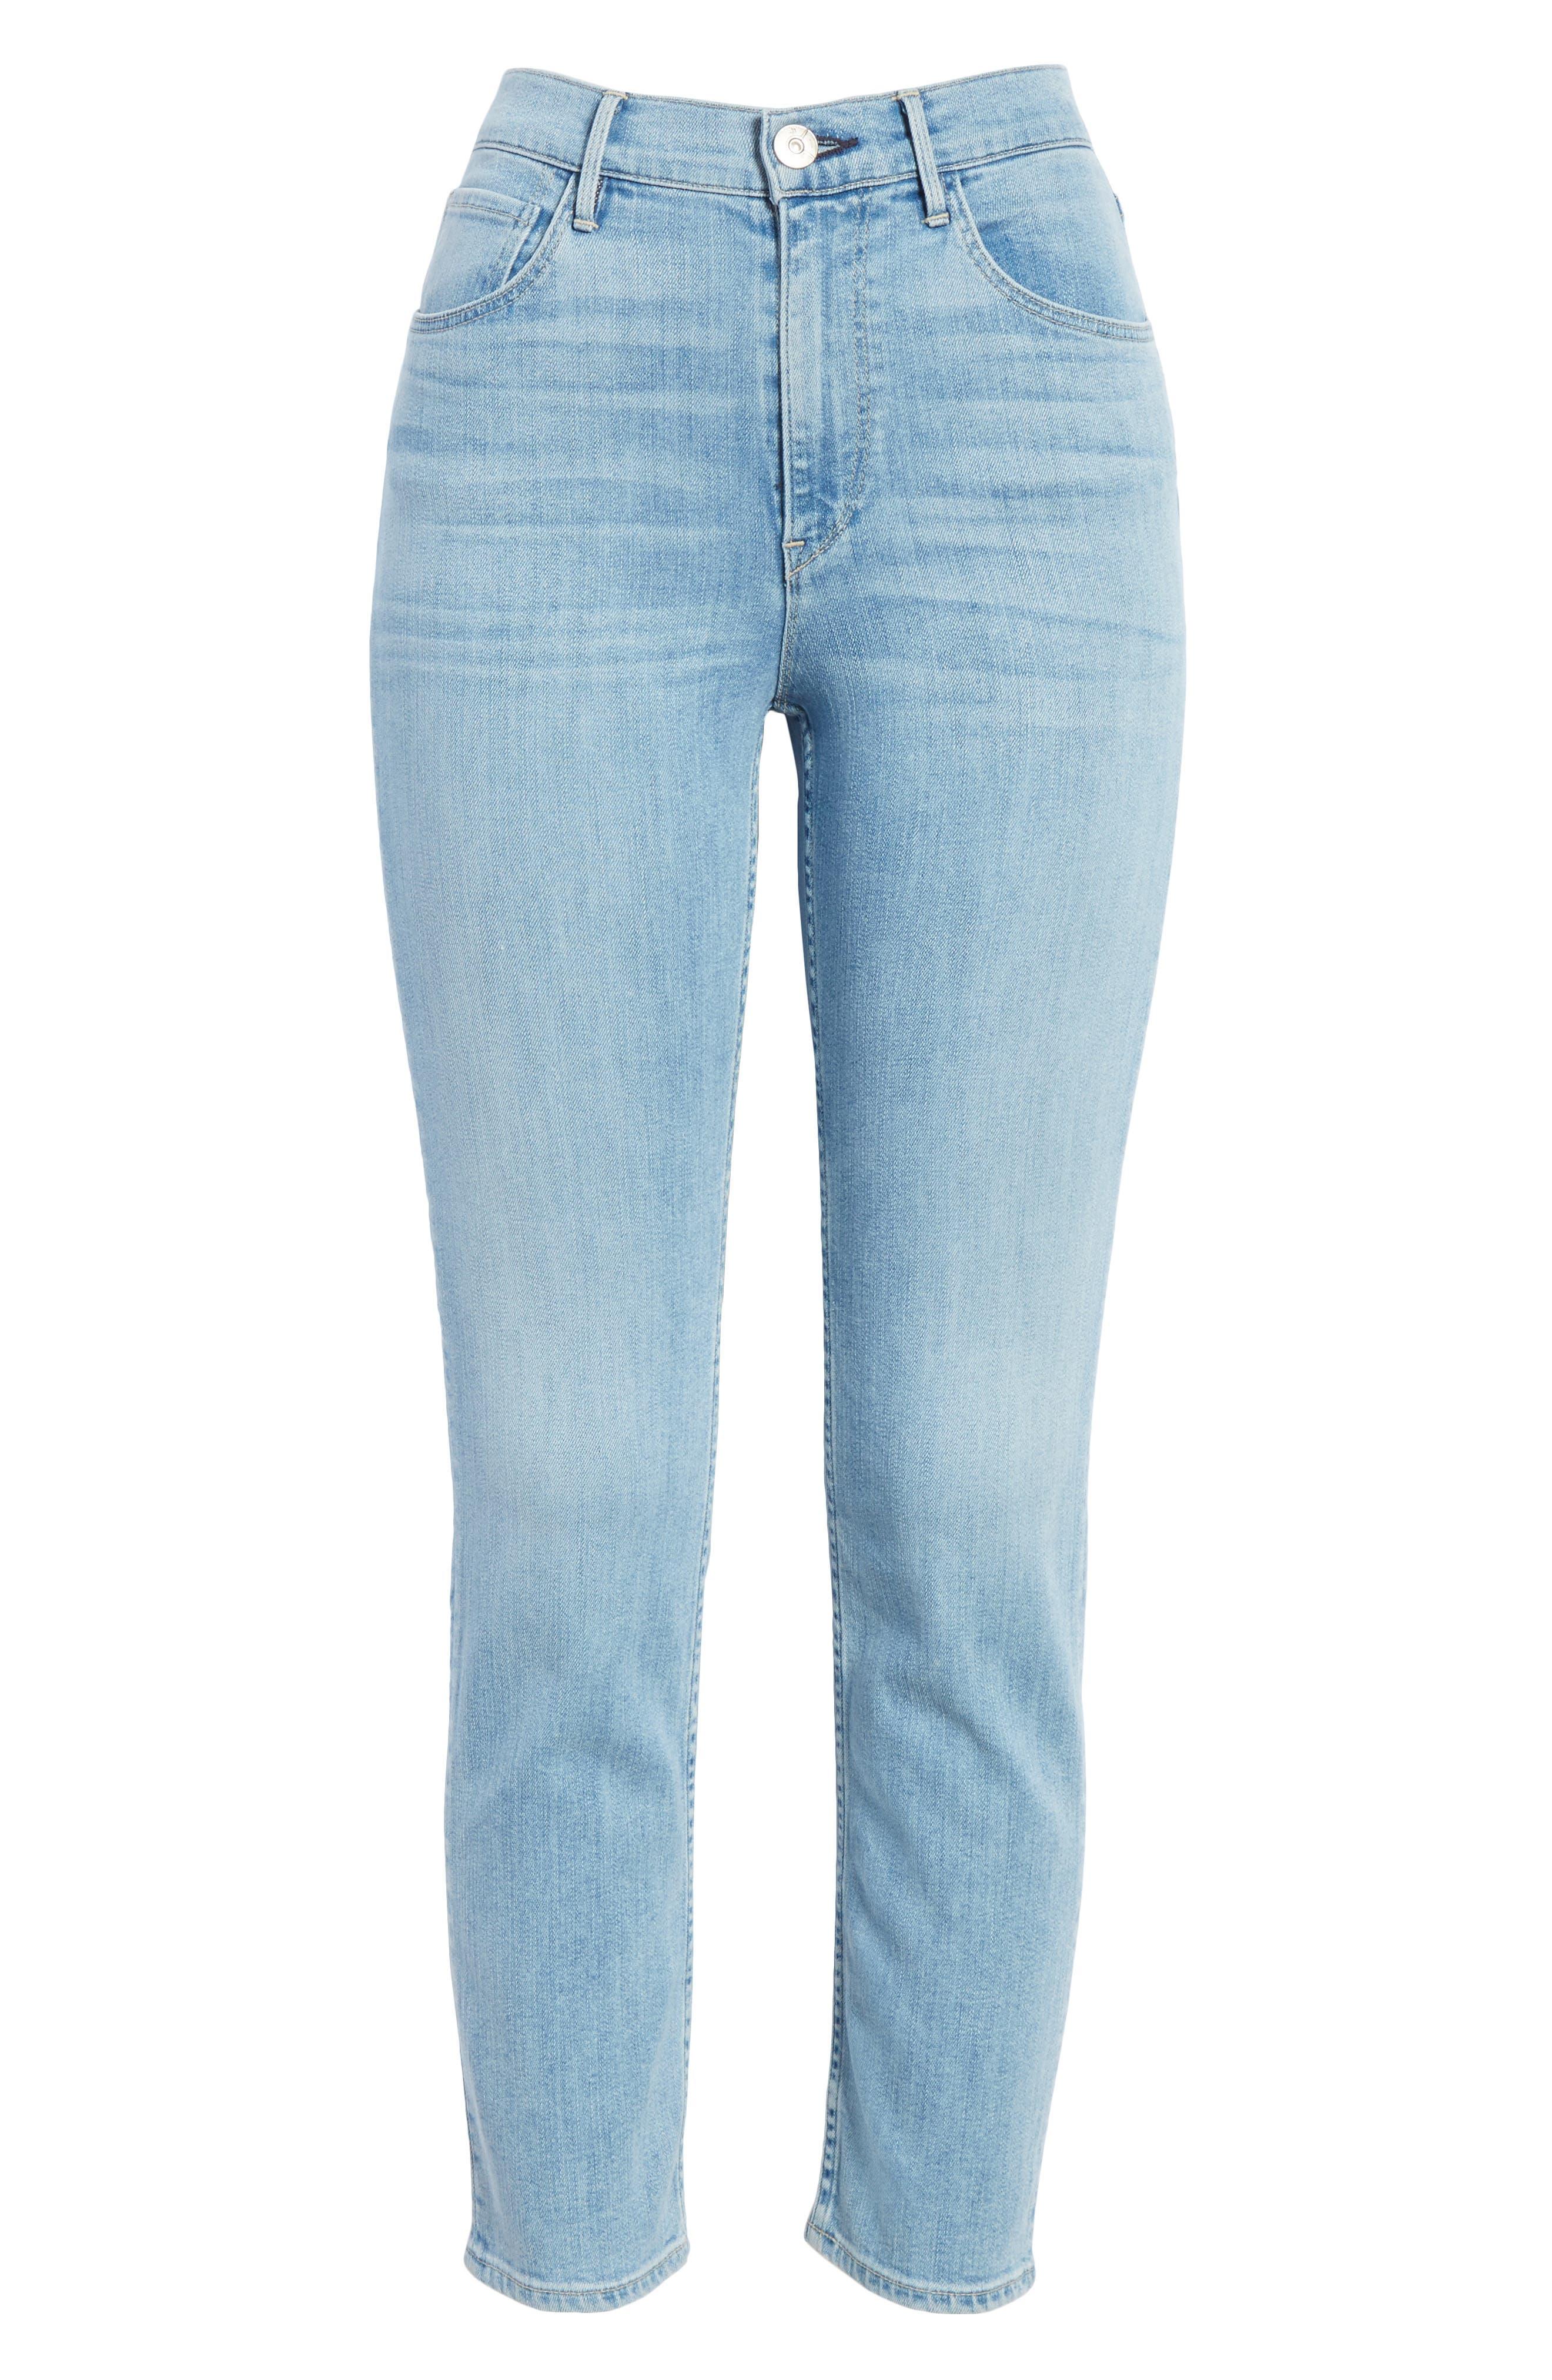 W4 Colette Crop Skinny Jeans,                             Alternate thumbnail 6, color,                             Carlo